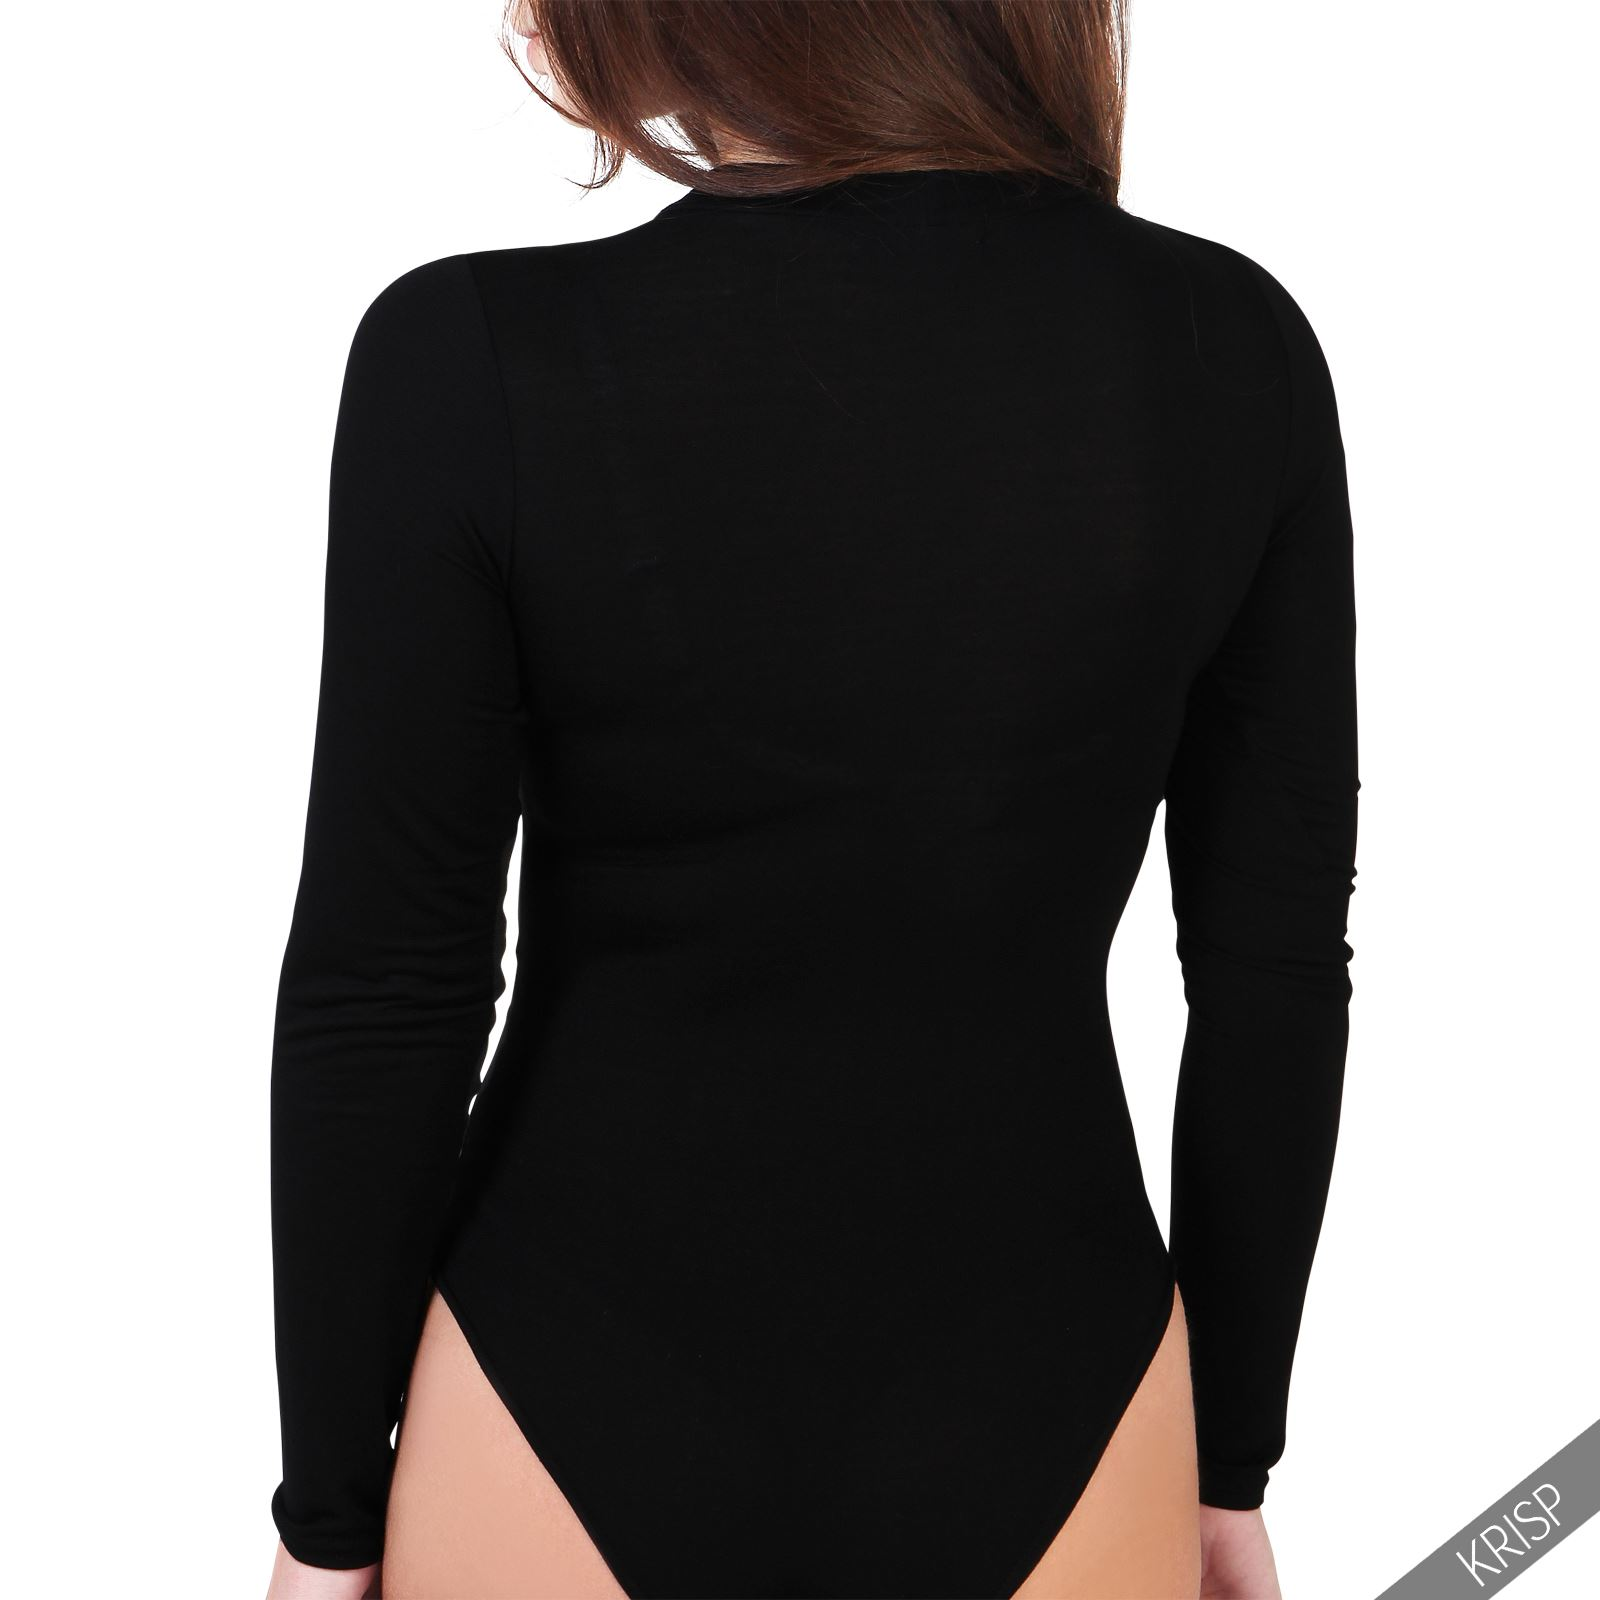 damen body bodysuit sexy stretch top kurzarm langarm. Black Bedroom Furniture Sets. Home Design Ideas